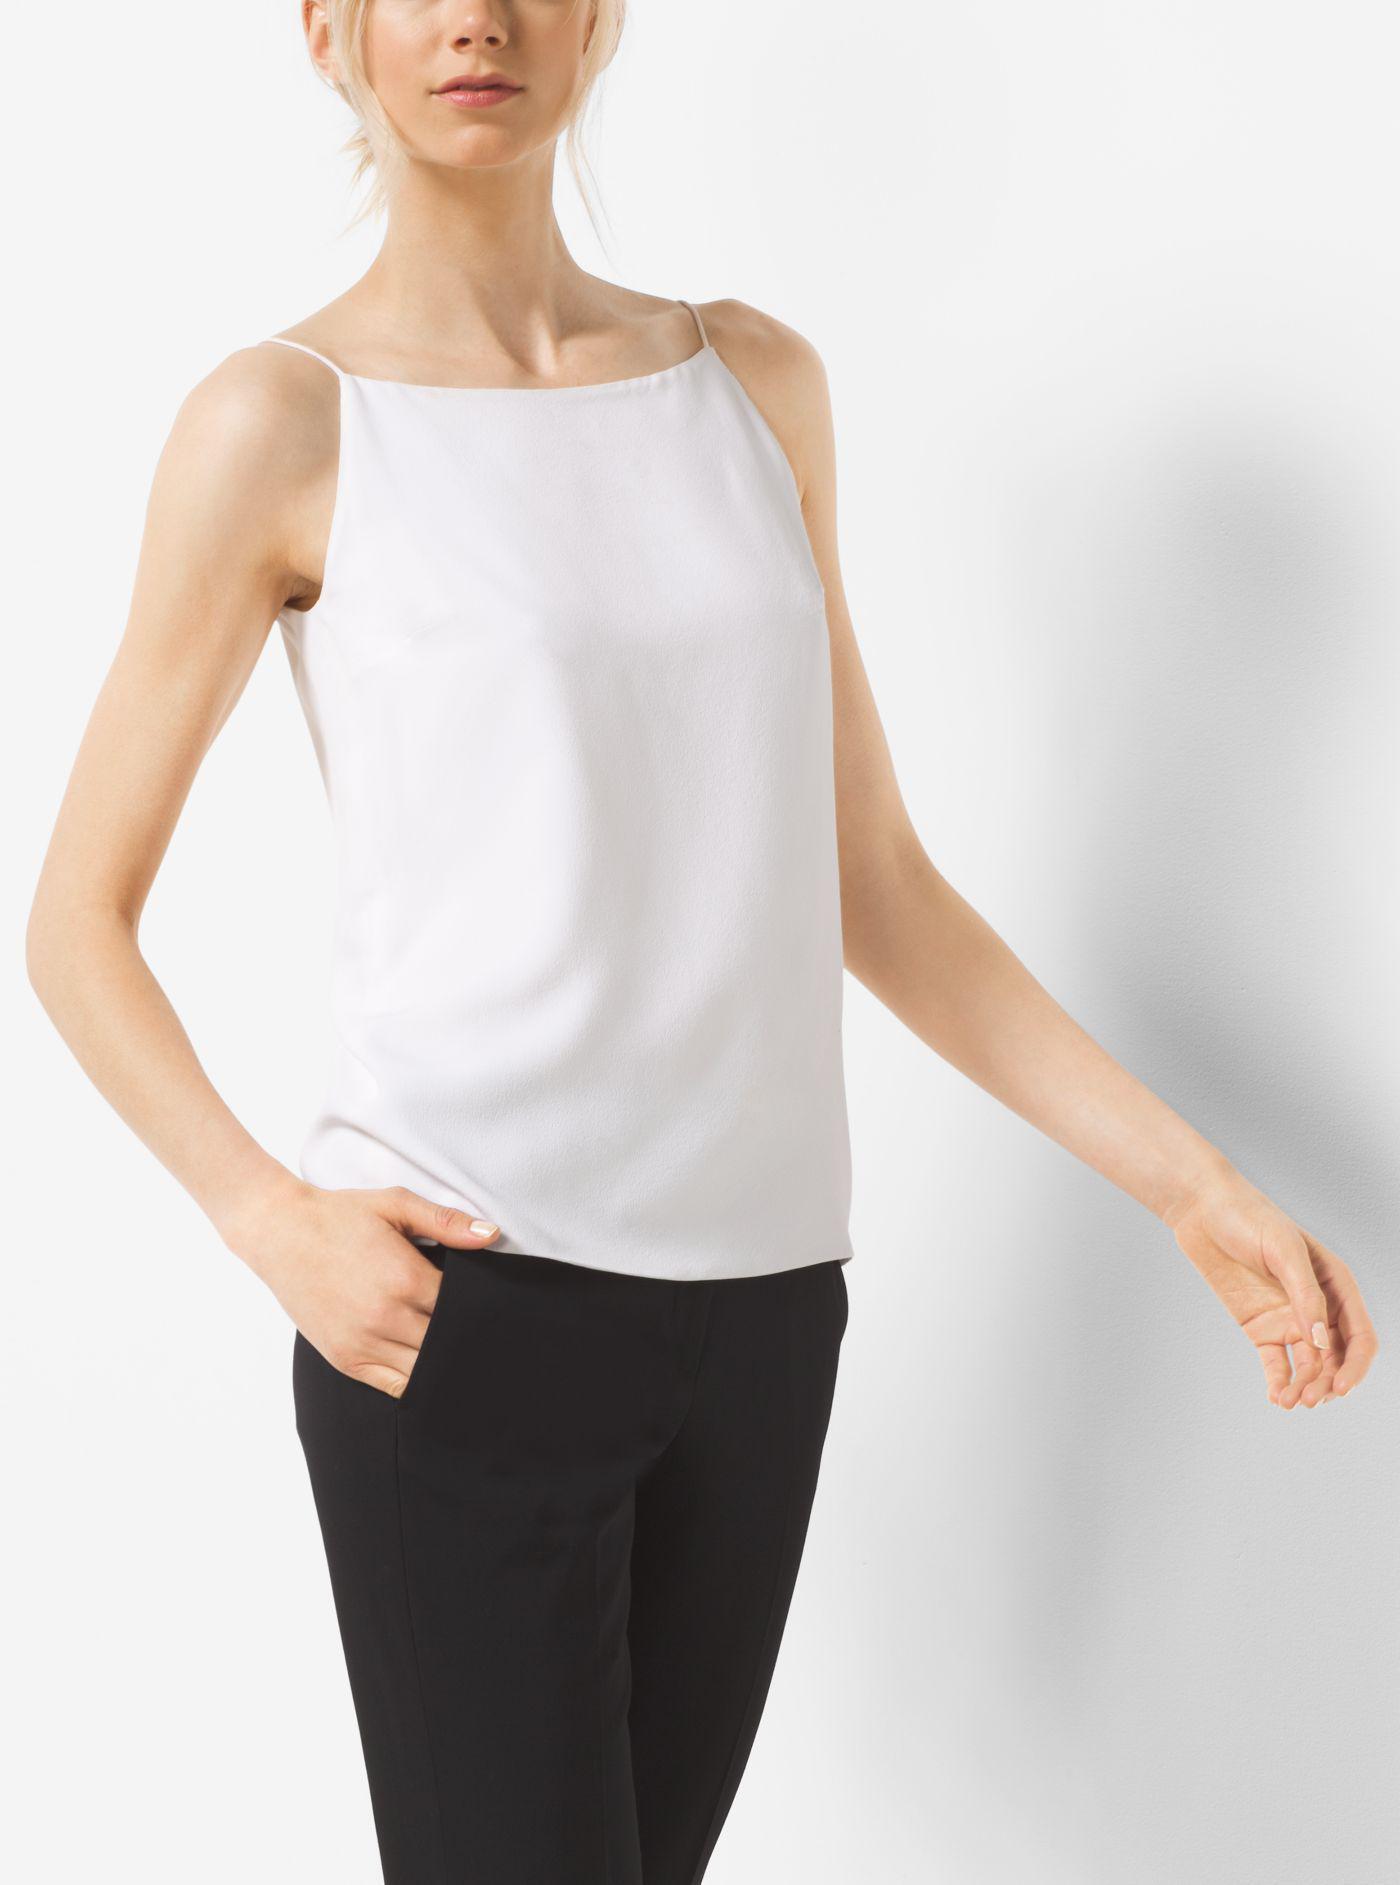 576b6b2d11960 Lyst - Michael Kors Silk Marocain Camisole in White